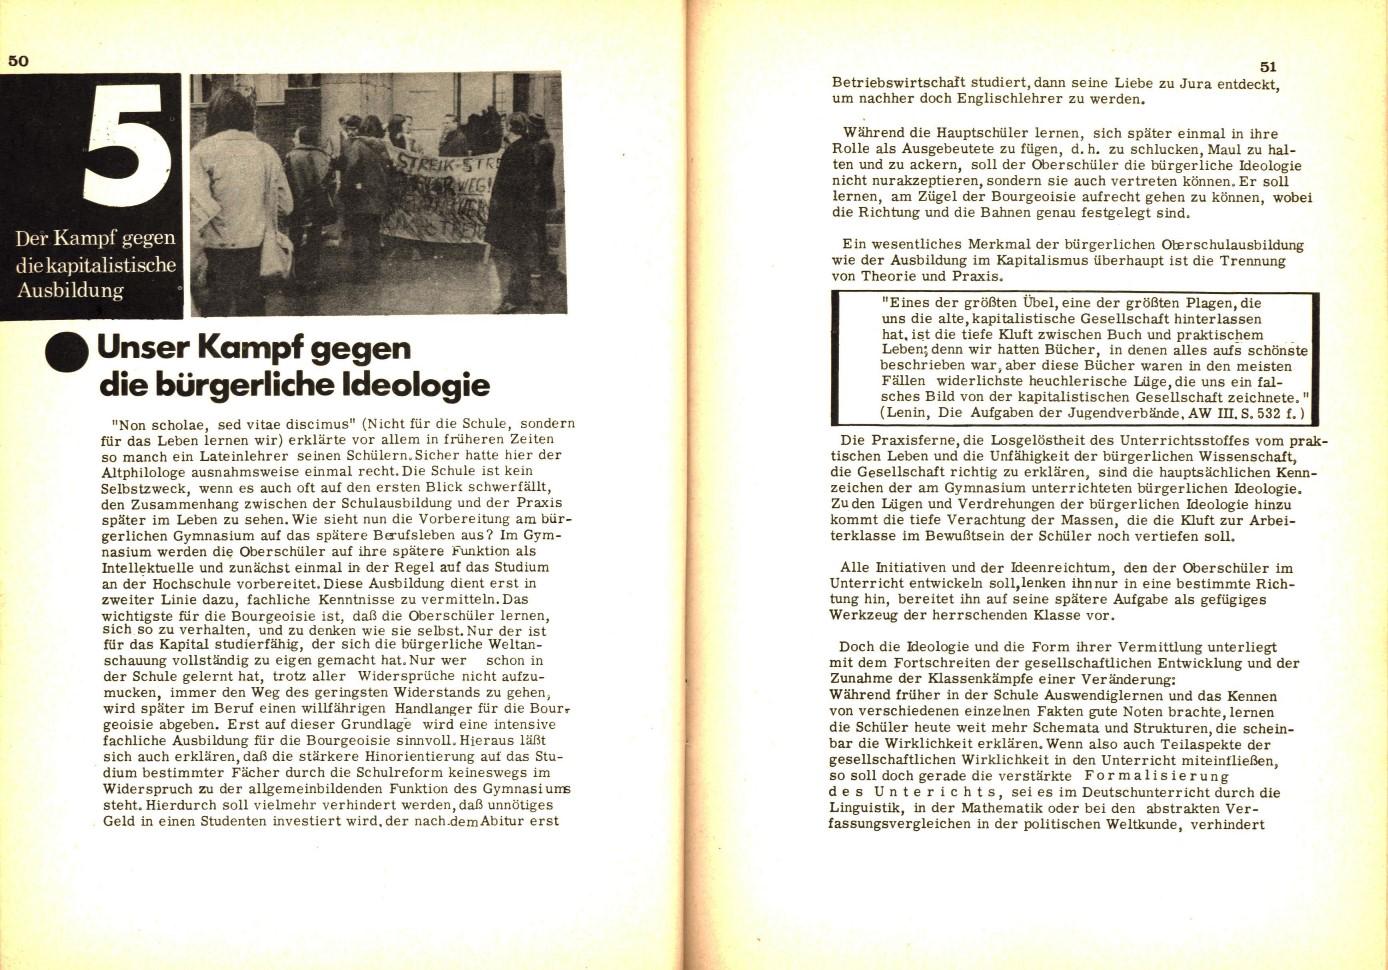 KOV_1973_Aktionsprogramm_28